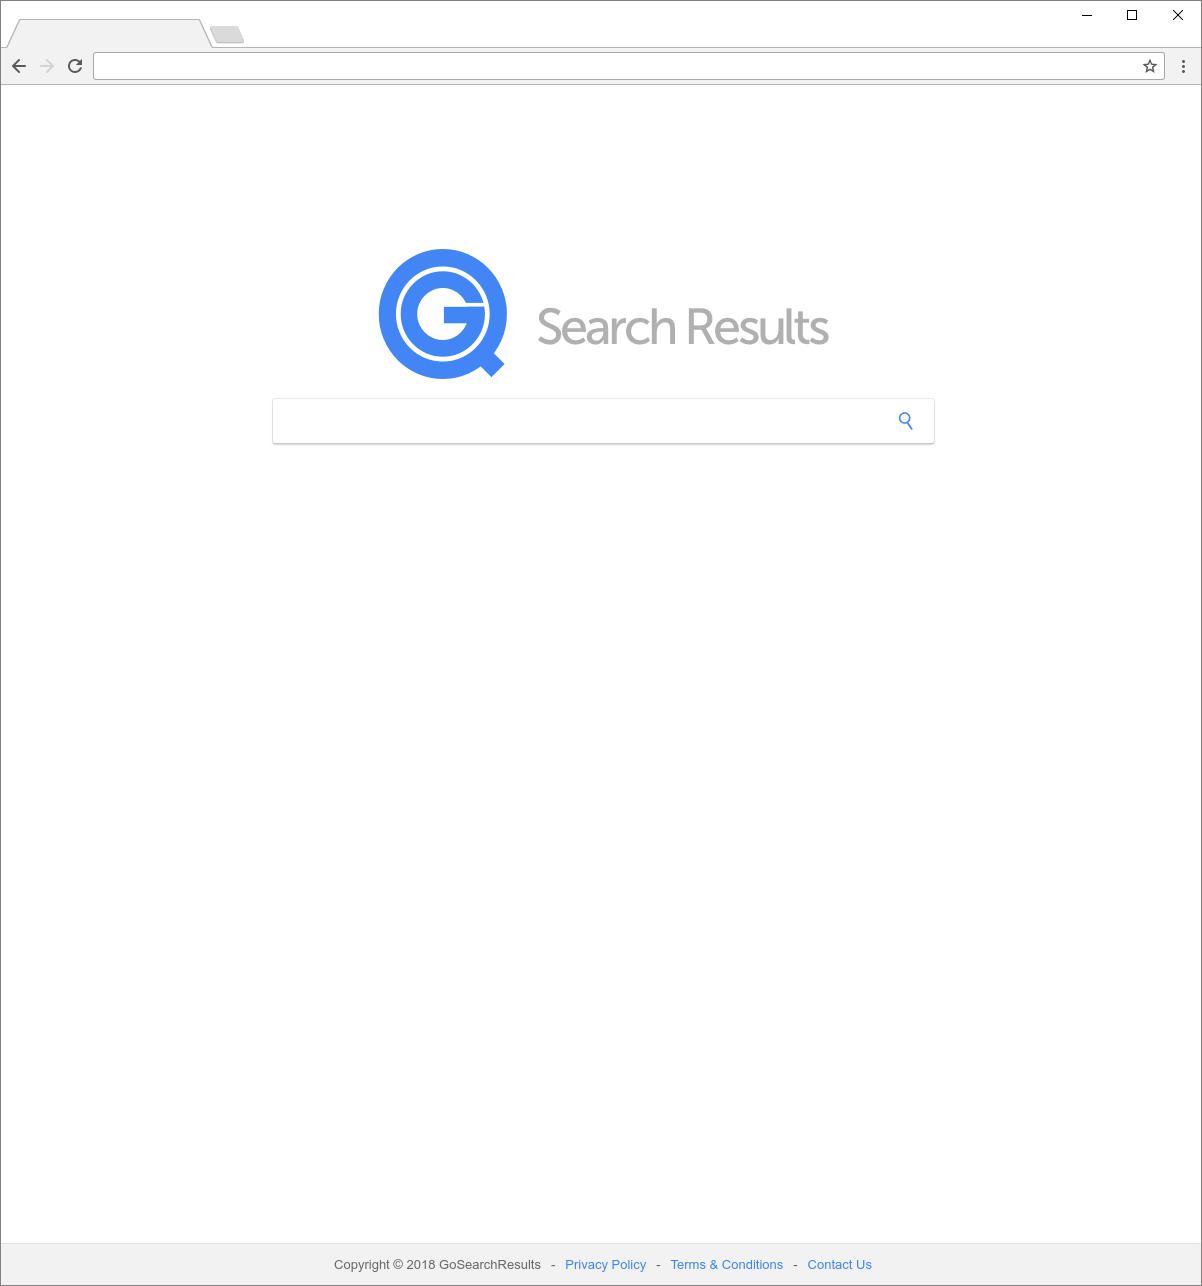 Gosearchresults.com Hijacker